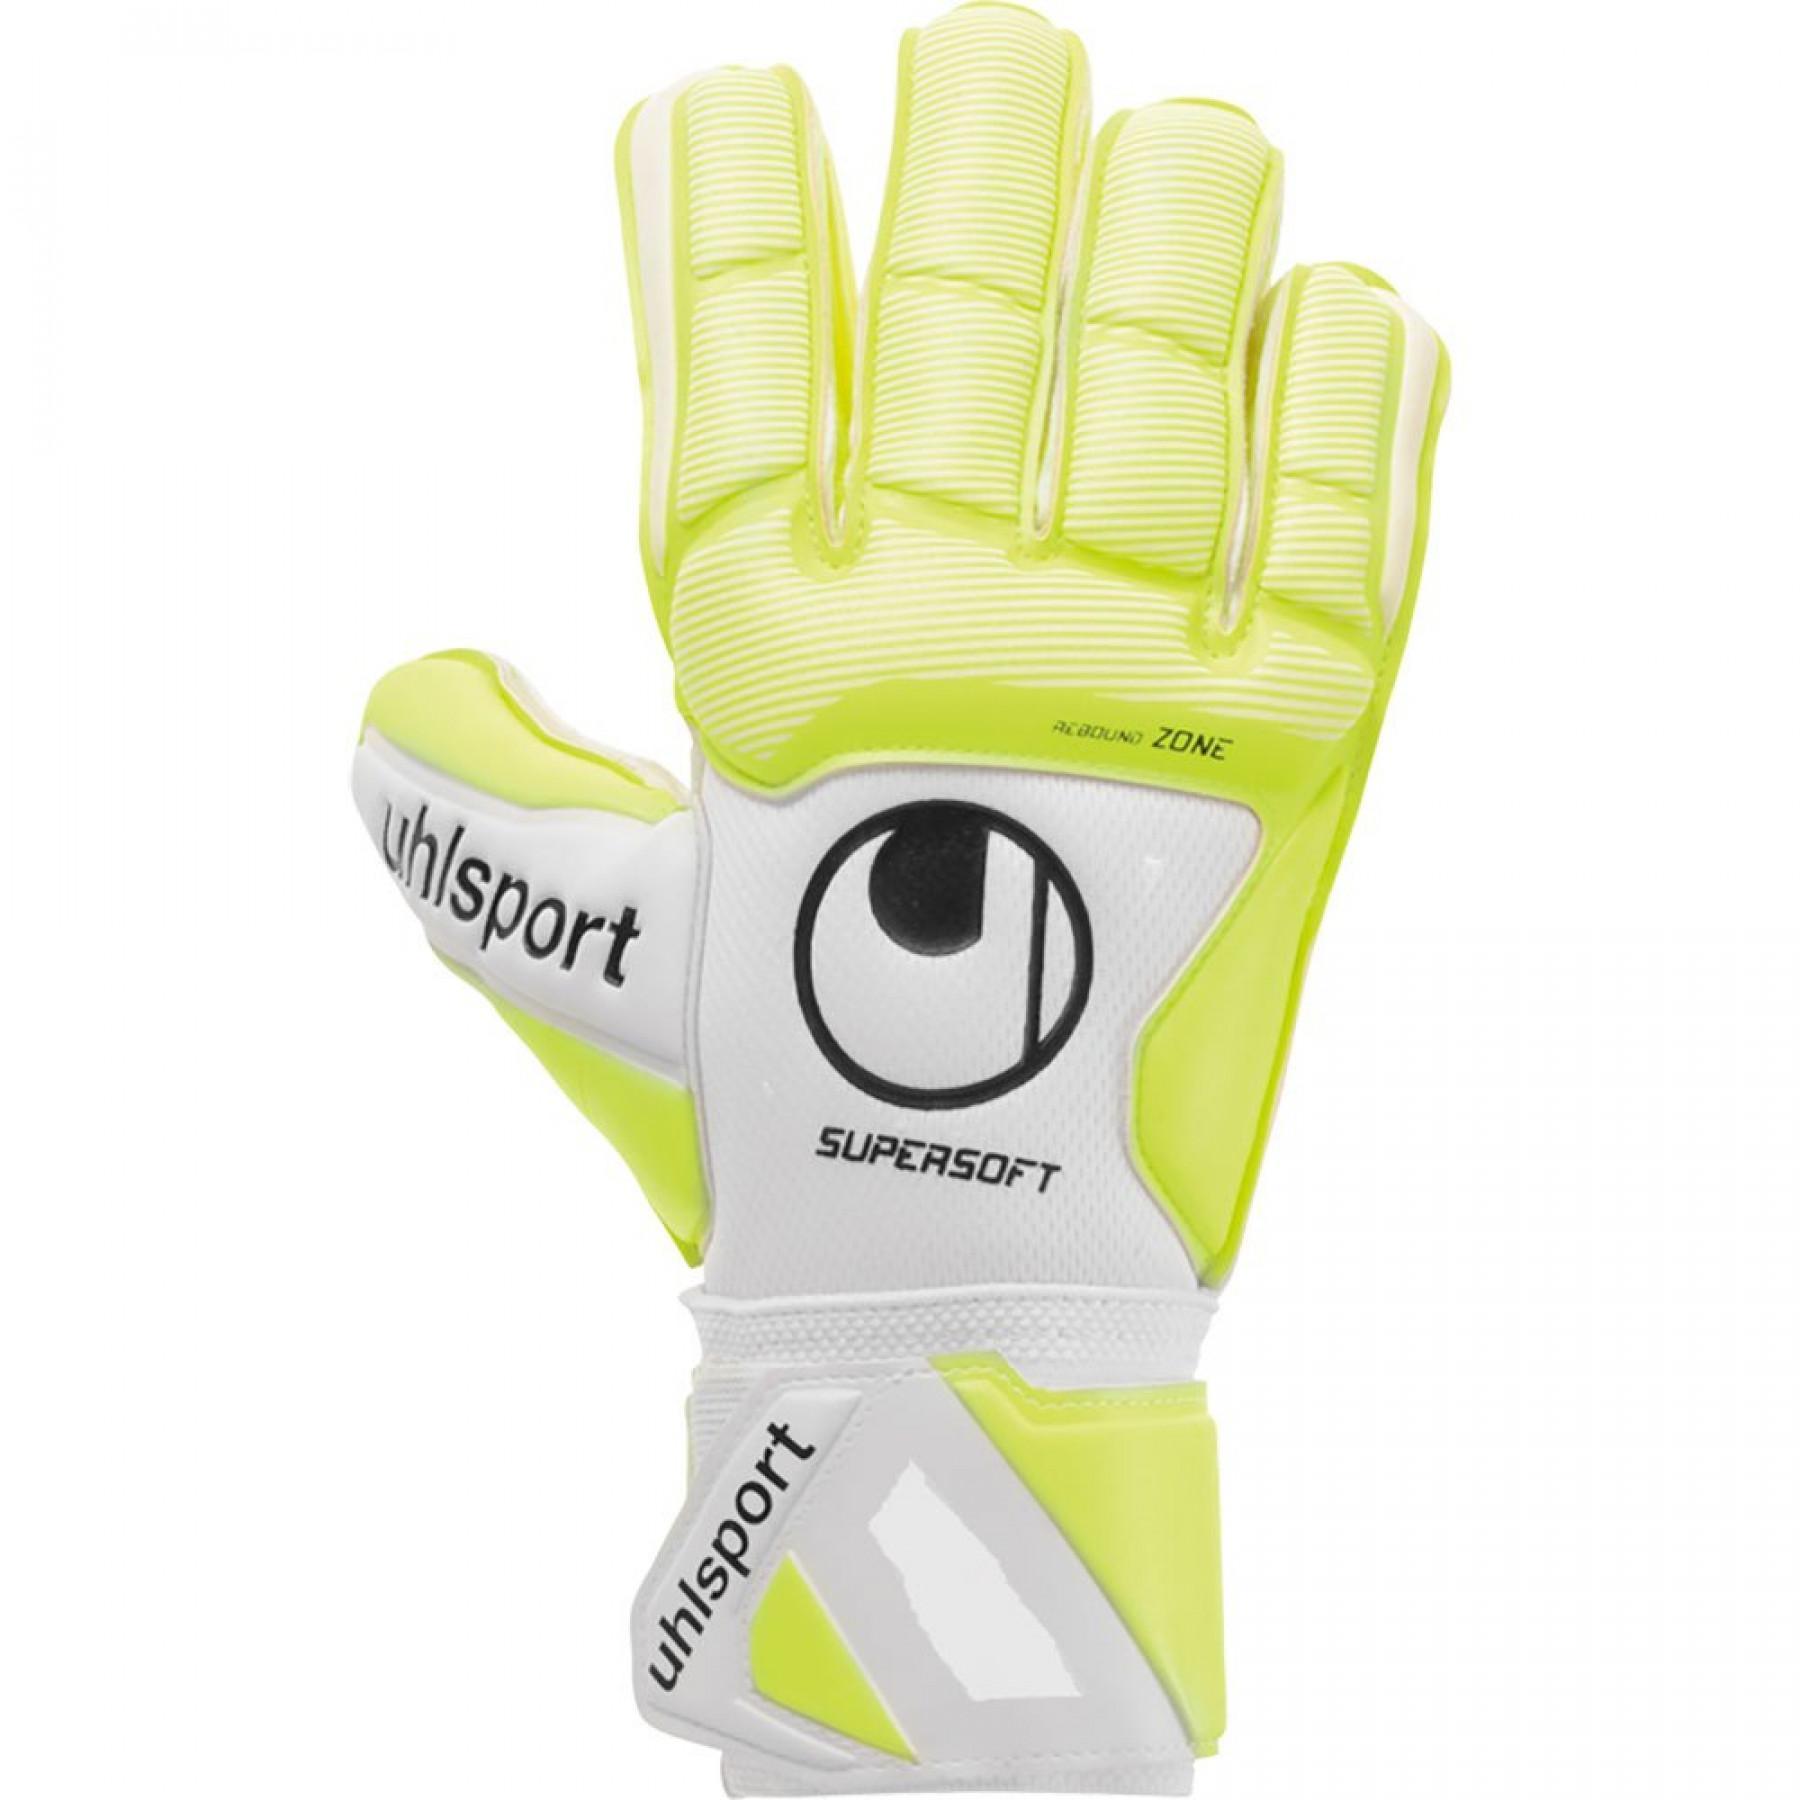 Uhlsport Gloves Pure Alliance supersoft